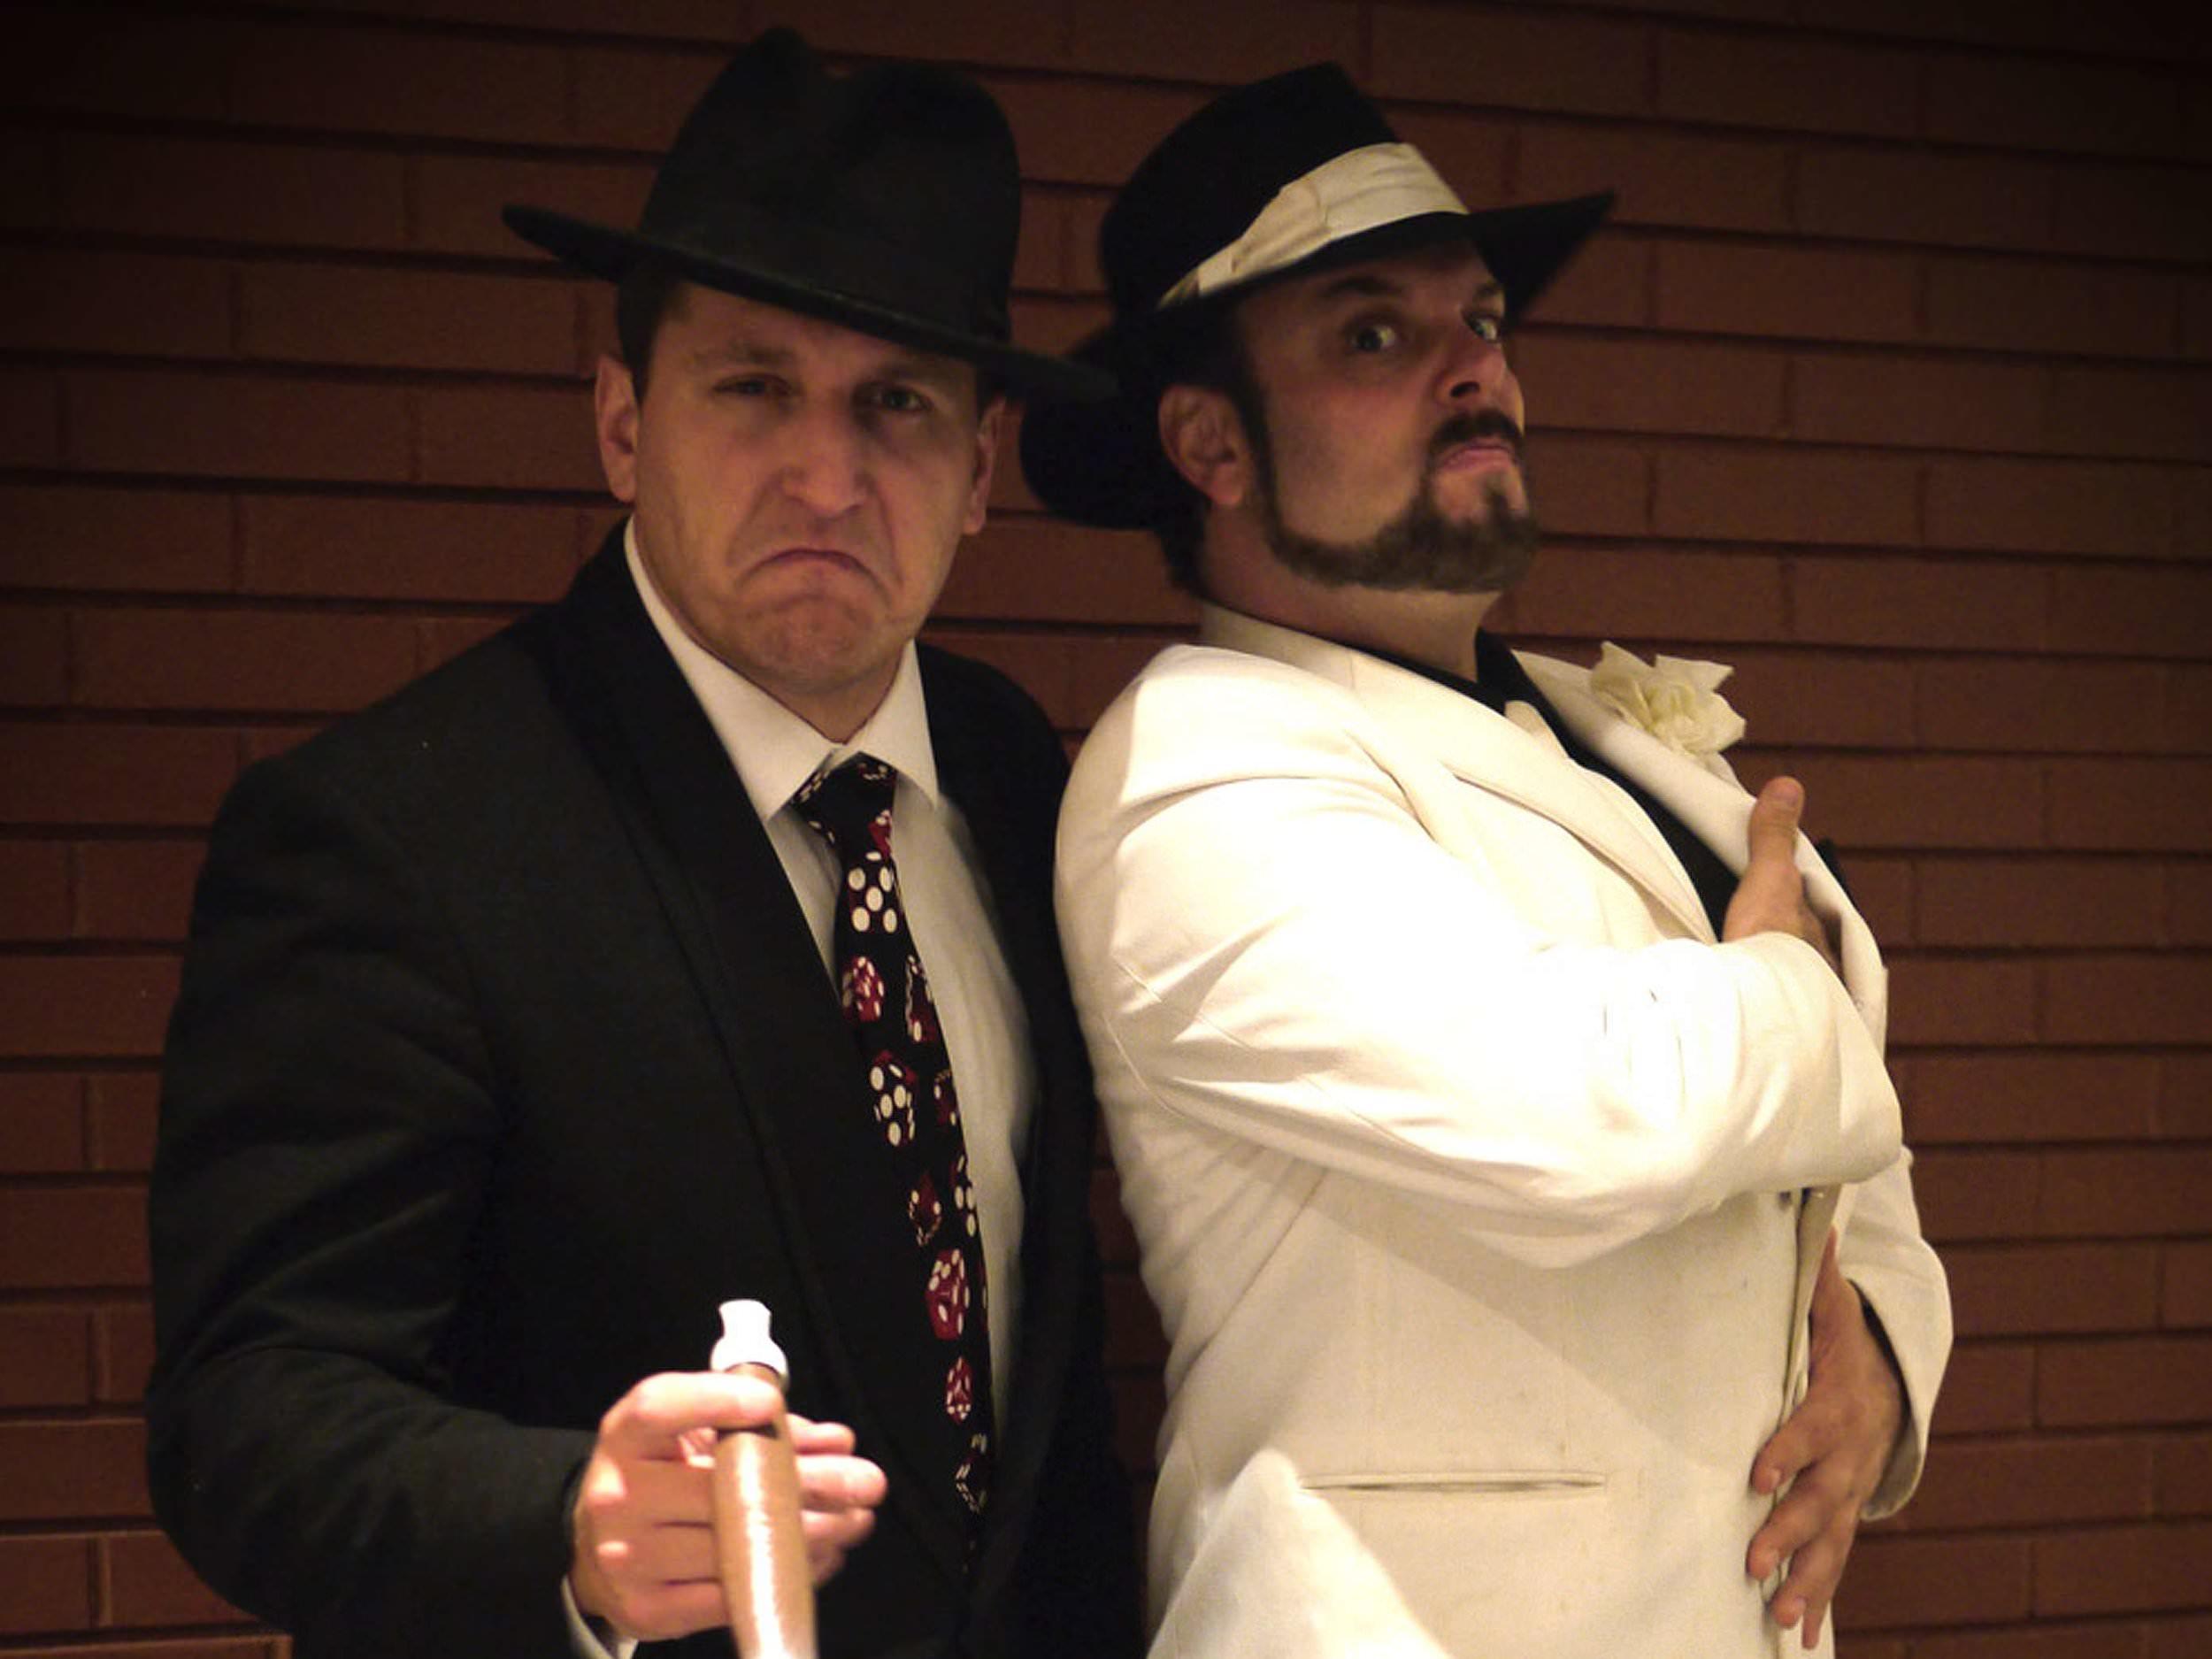 custom-murder-mystery-at-isabella-stewart-gardner-museum-halloween-party-in-boston-ma-with-harrington-events  .jpg